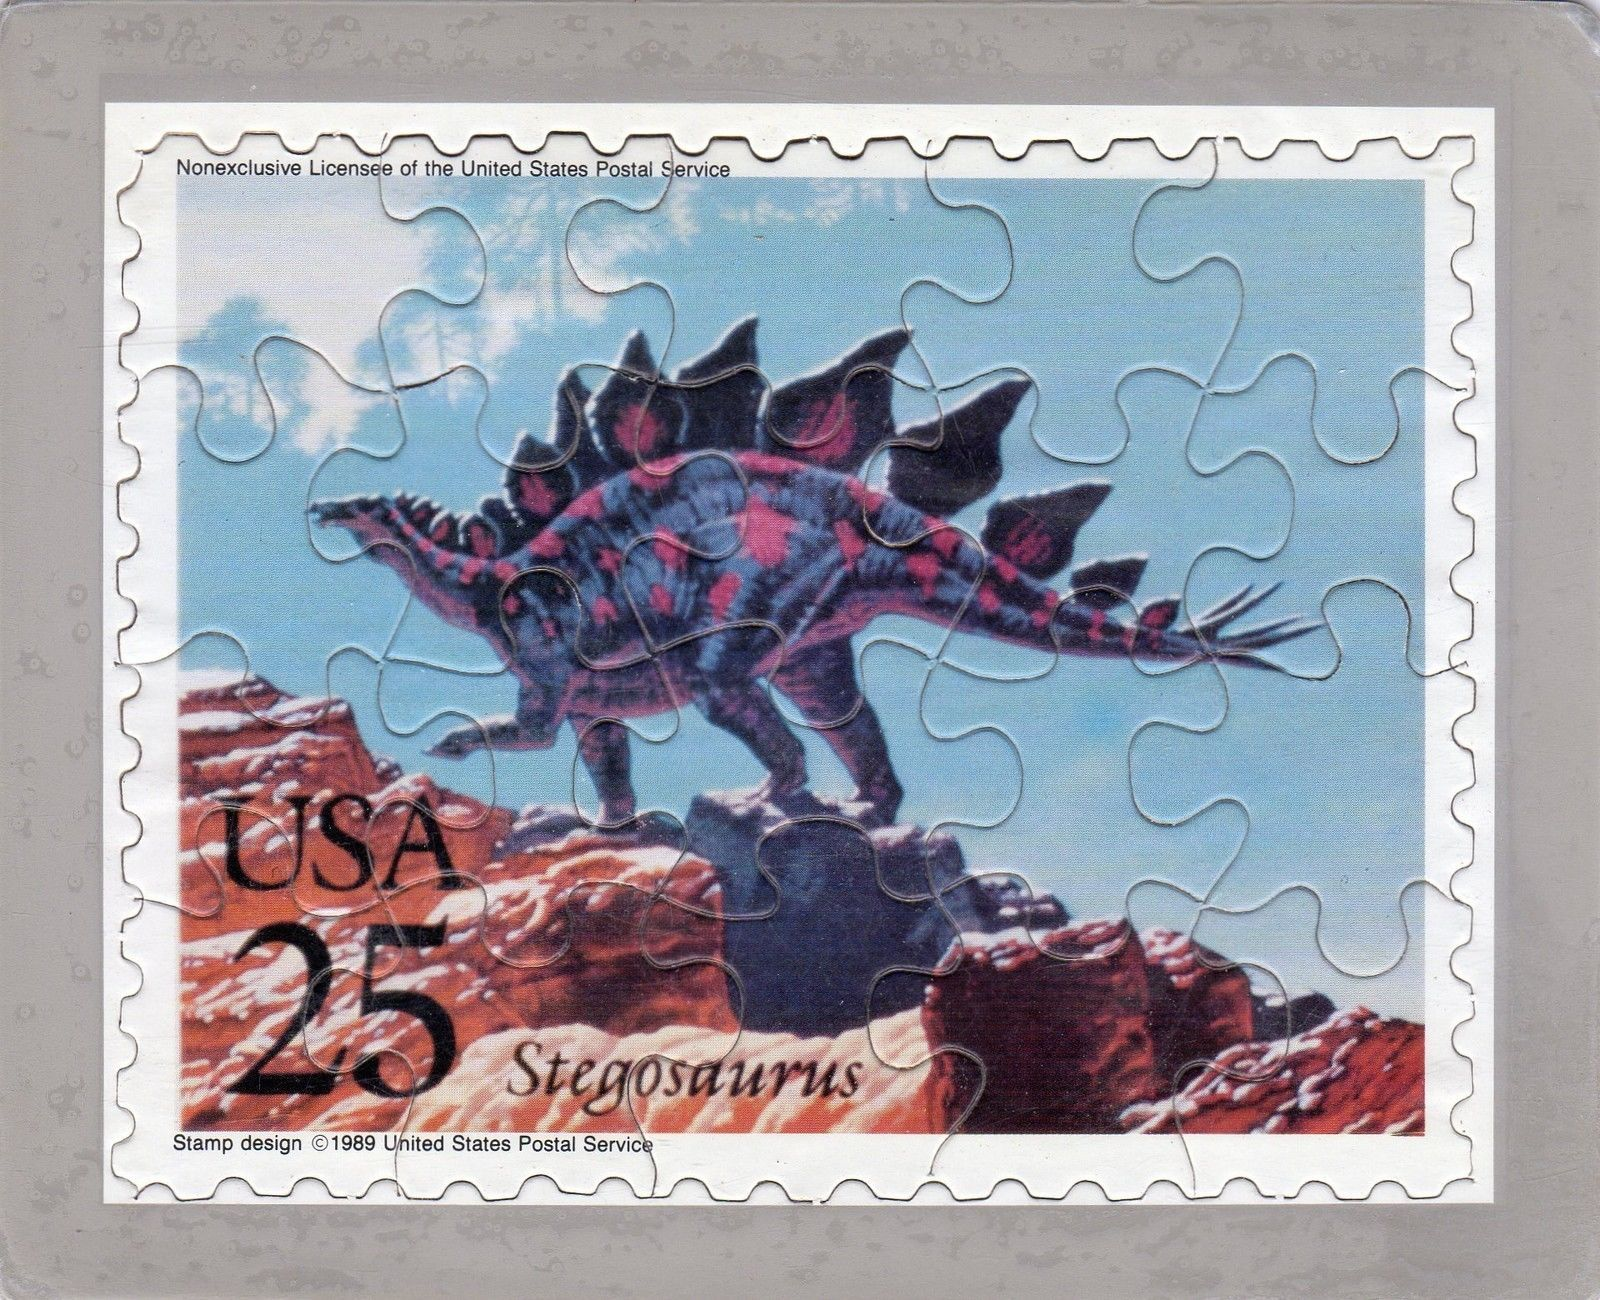 USPS POSTCARD - Dinosaurs Commemorative Puzzle series - STEGOSAURUS